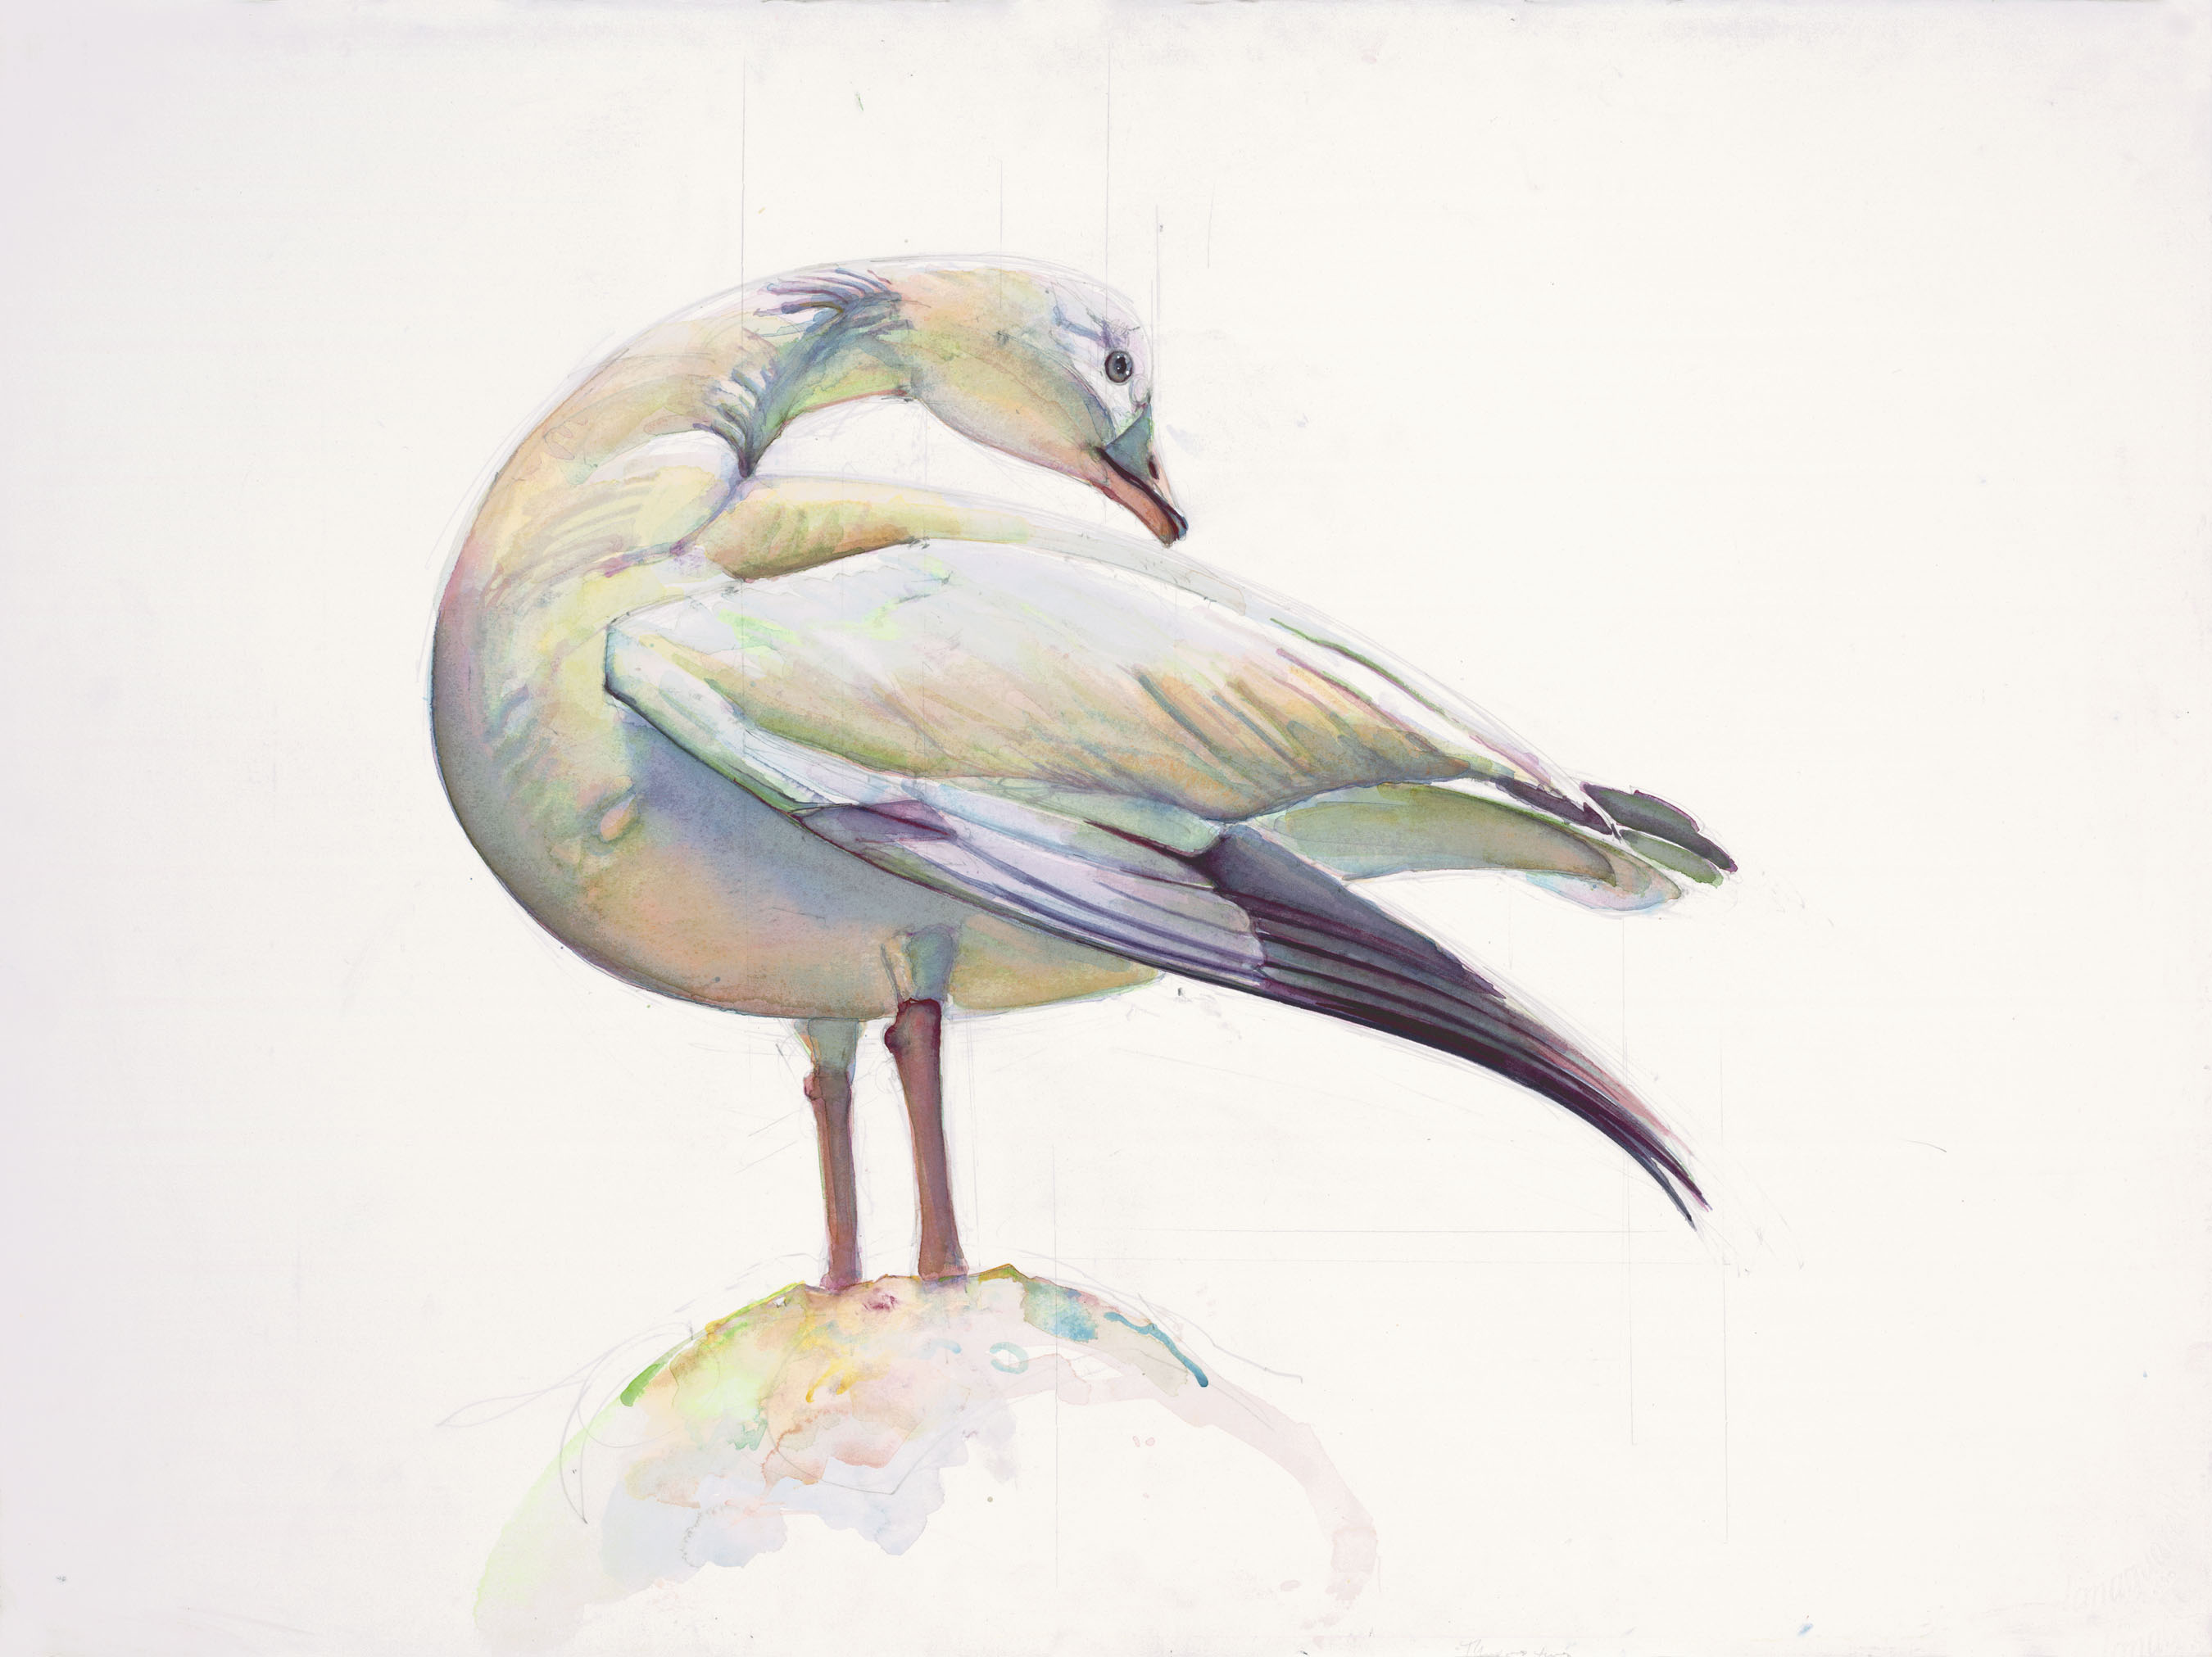 102 Ross' goose